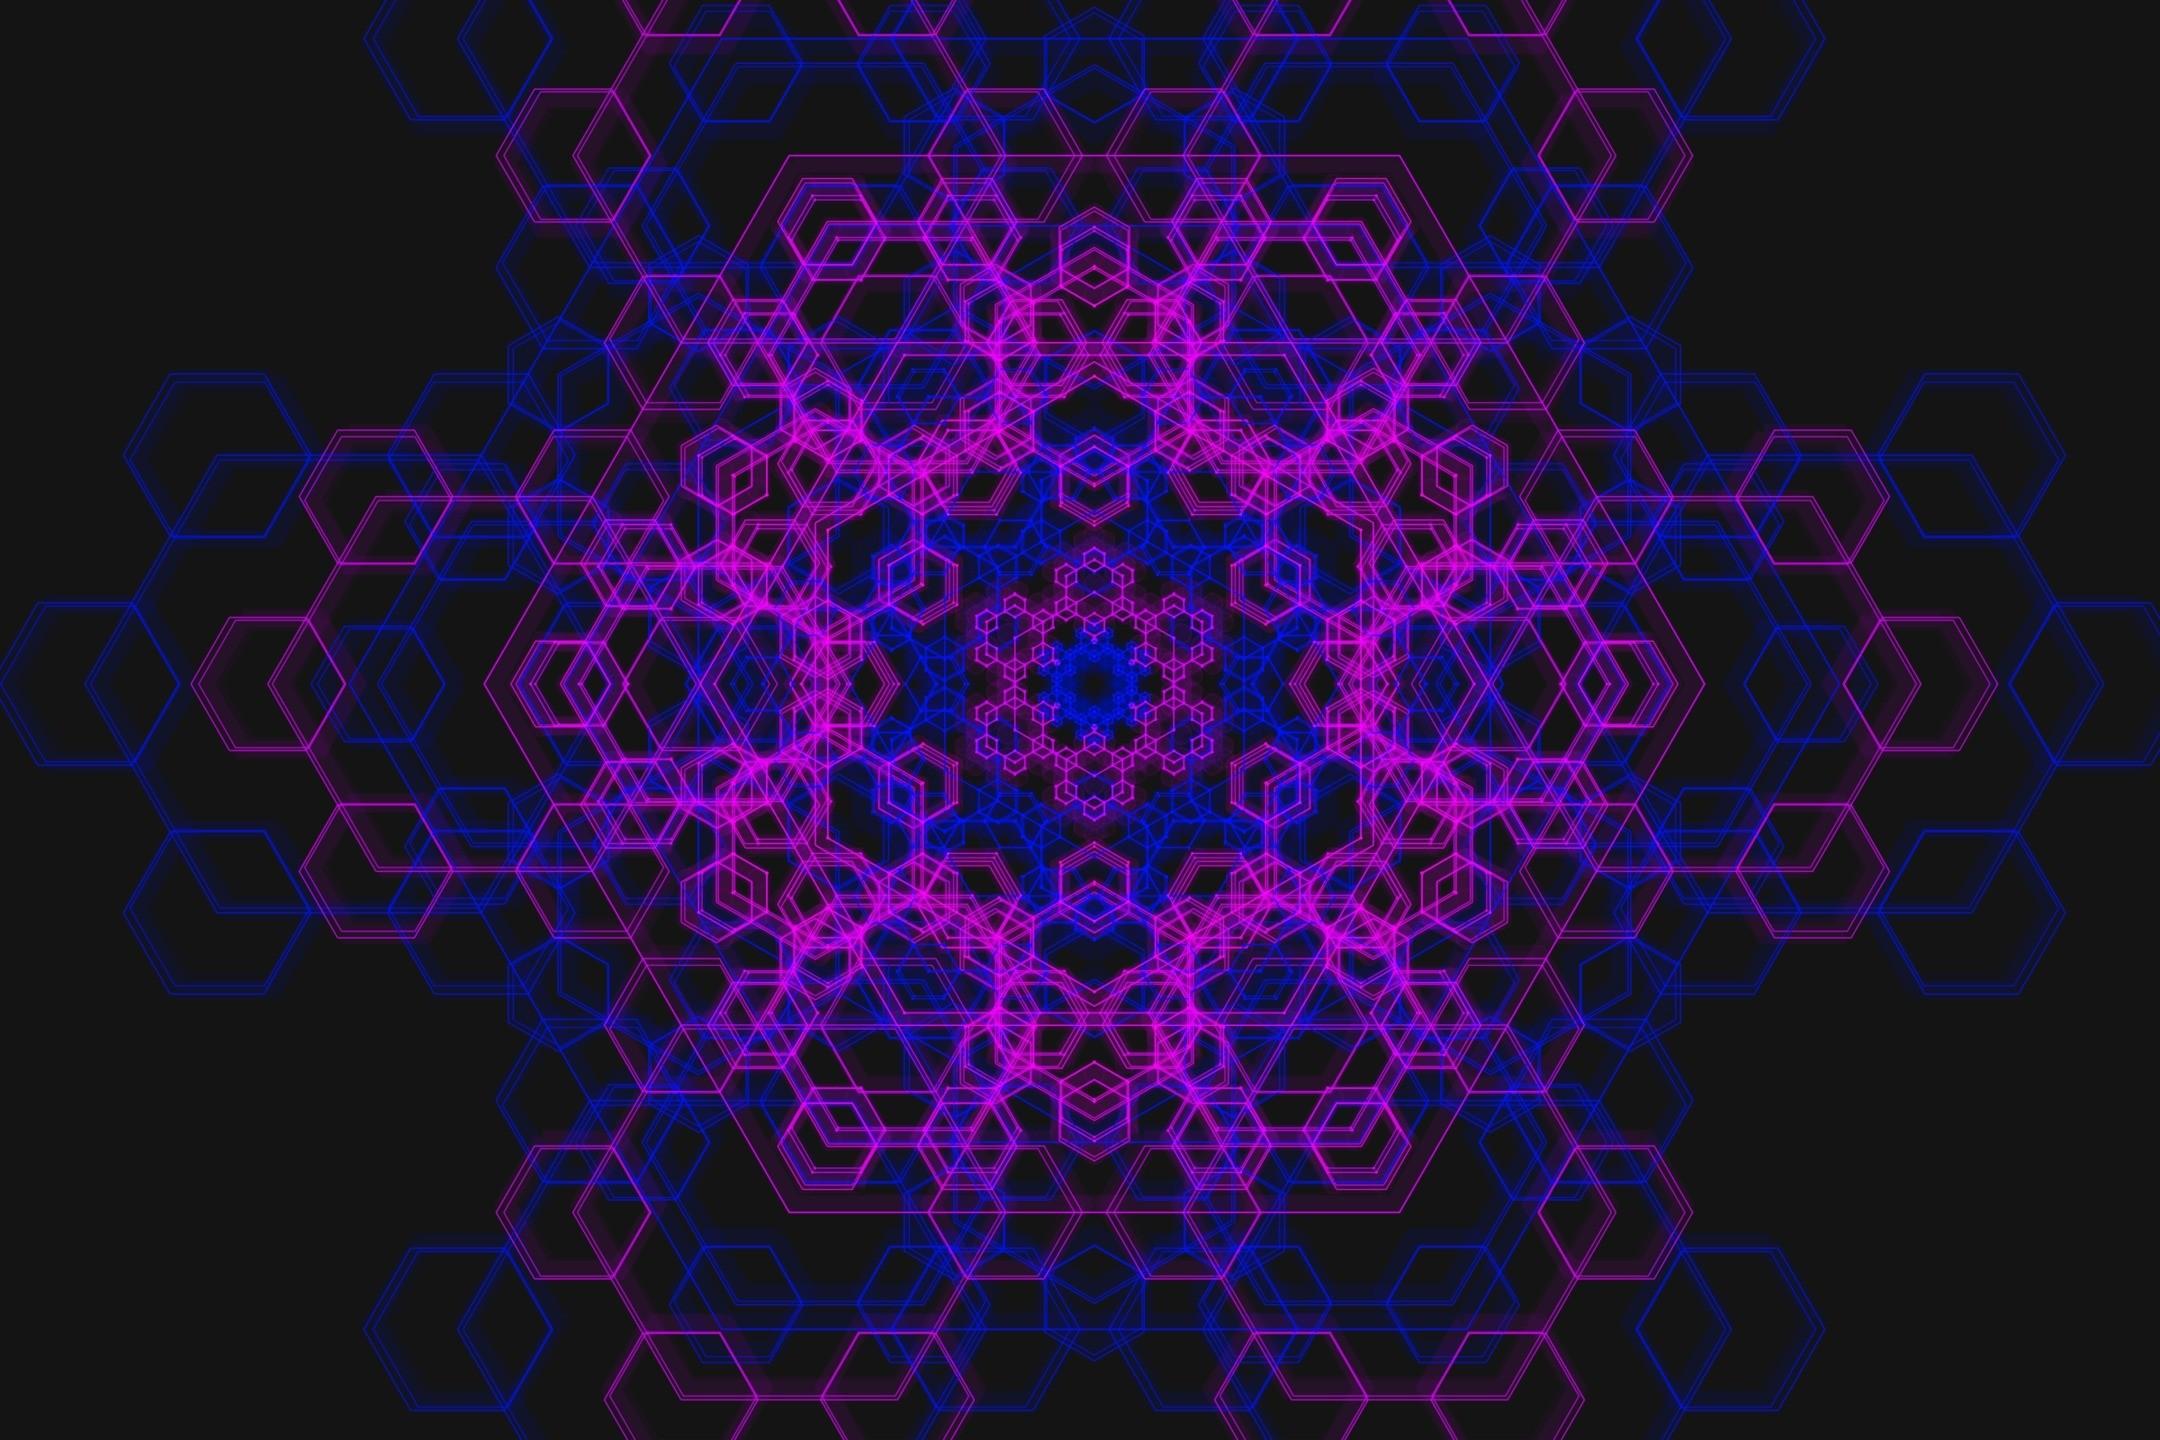 … sacred geometry hd wallpapers 23261 baltana …